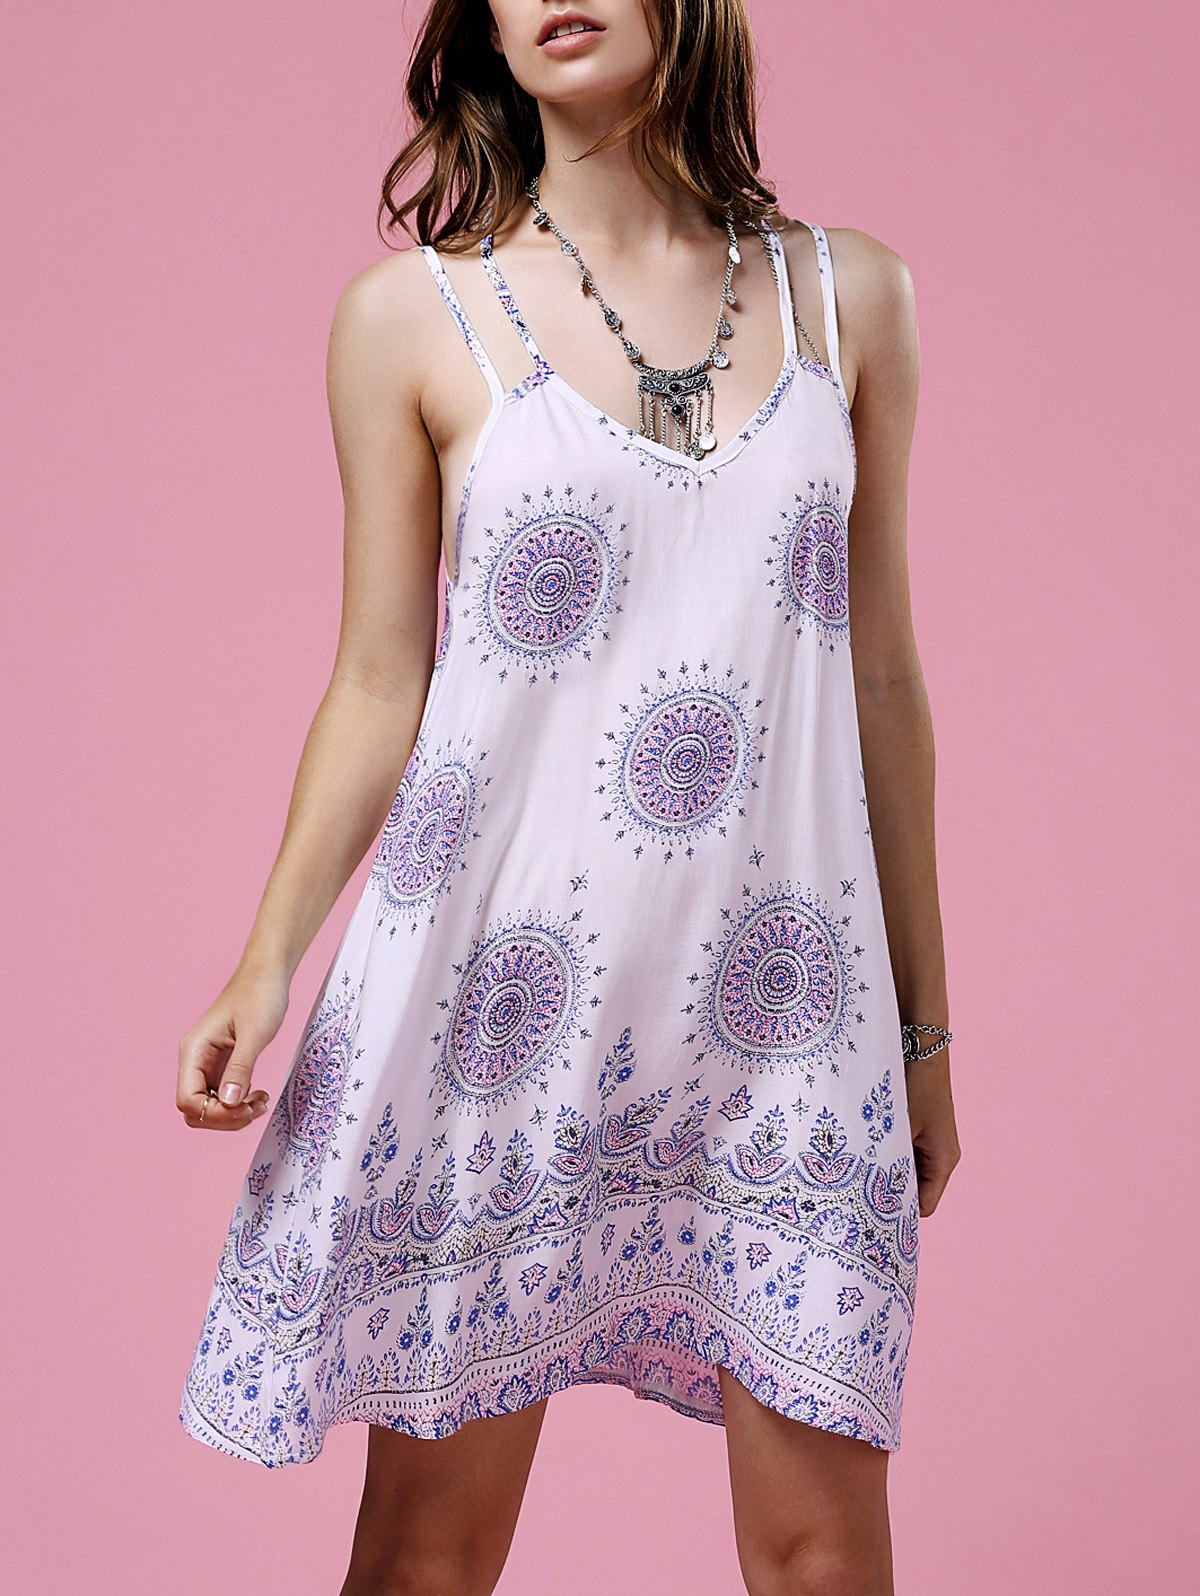 Ethnic Print Cami Backless Dress